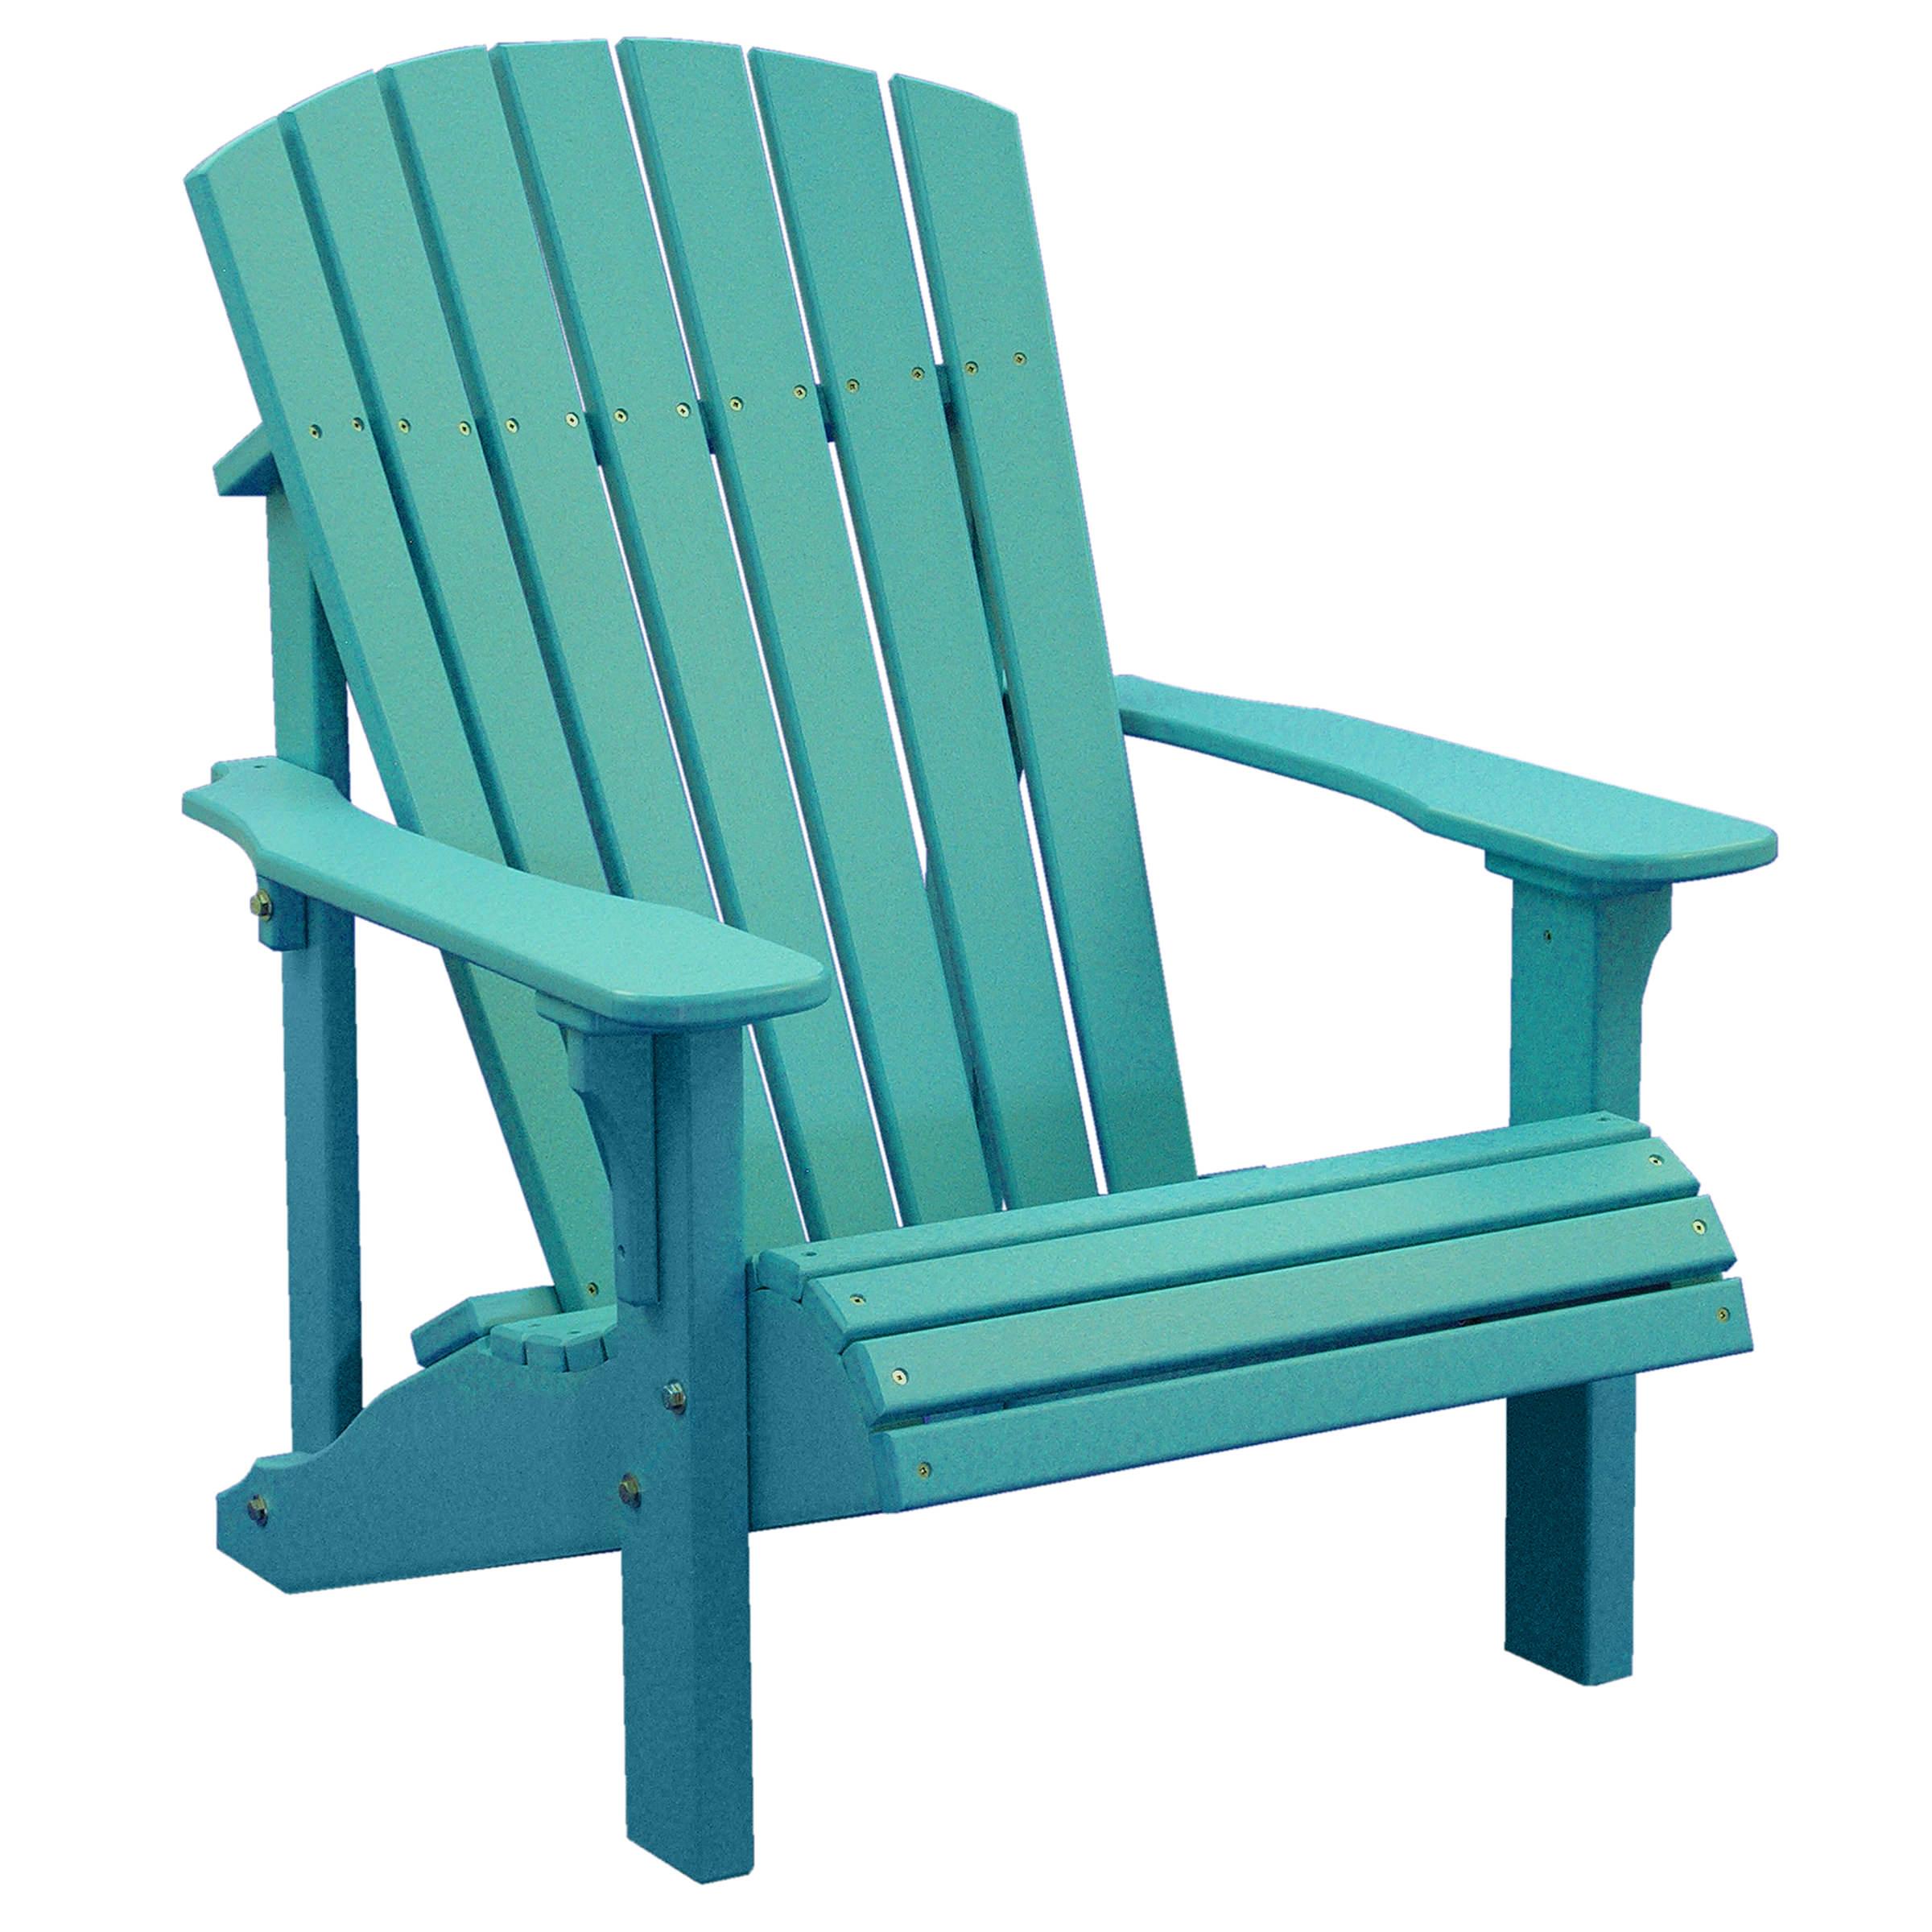 Luxcraft Crestville Deluxe Adirondack Chair in Solid Tropical